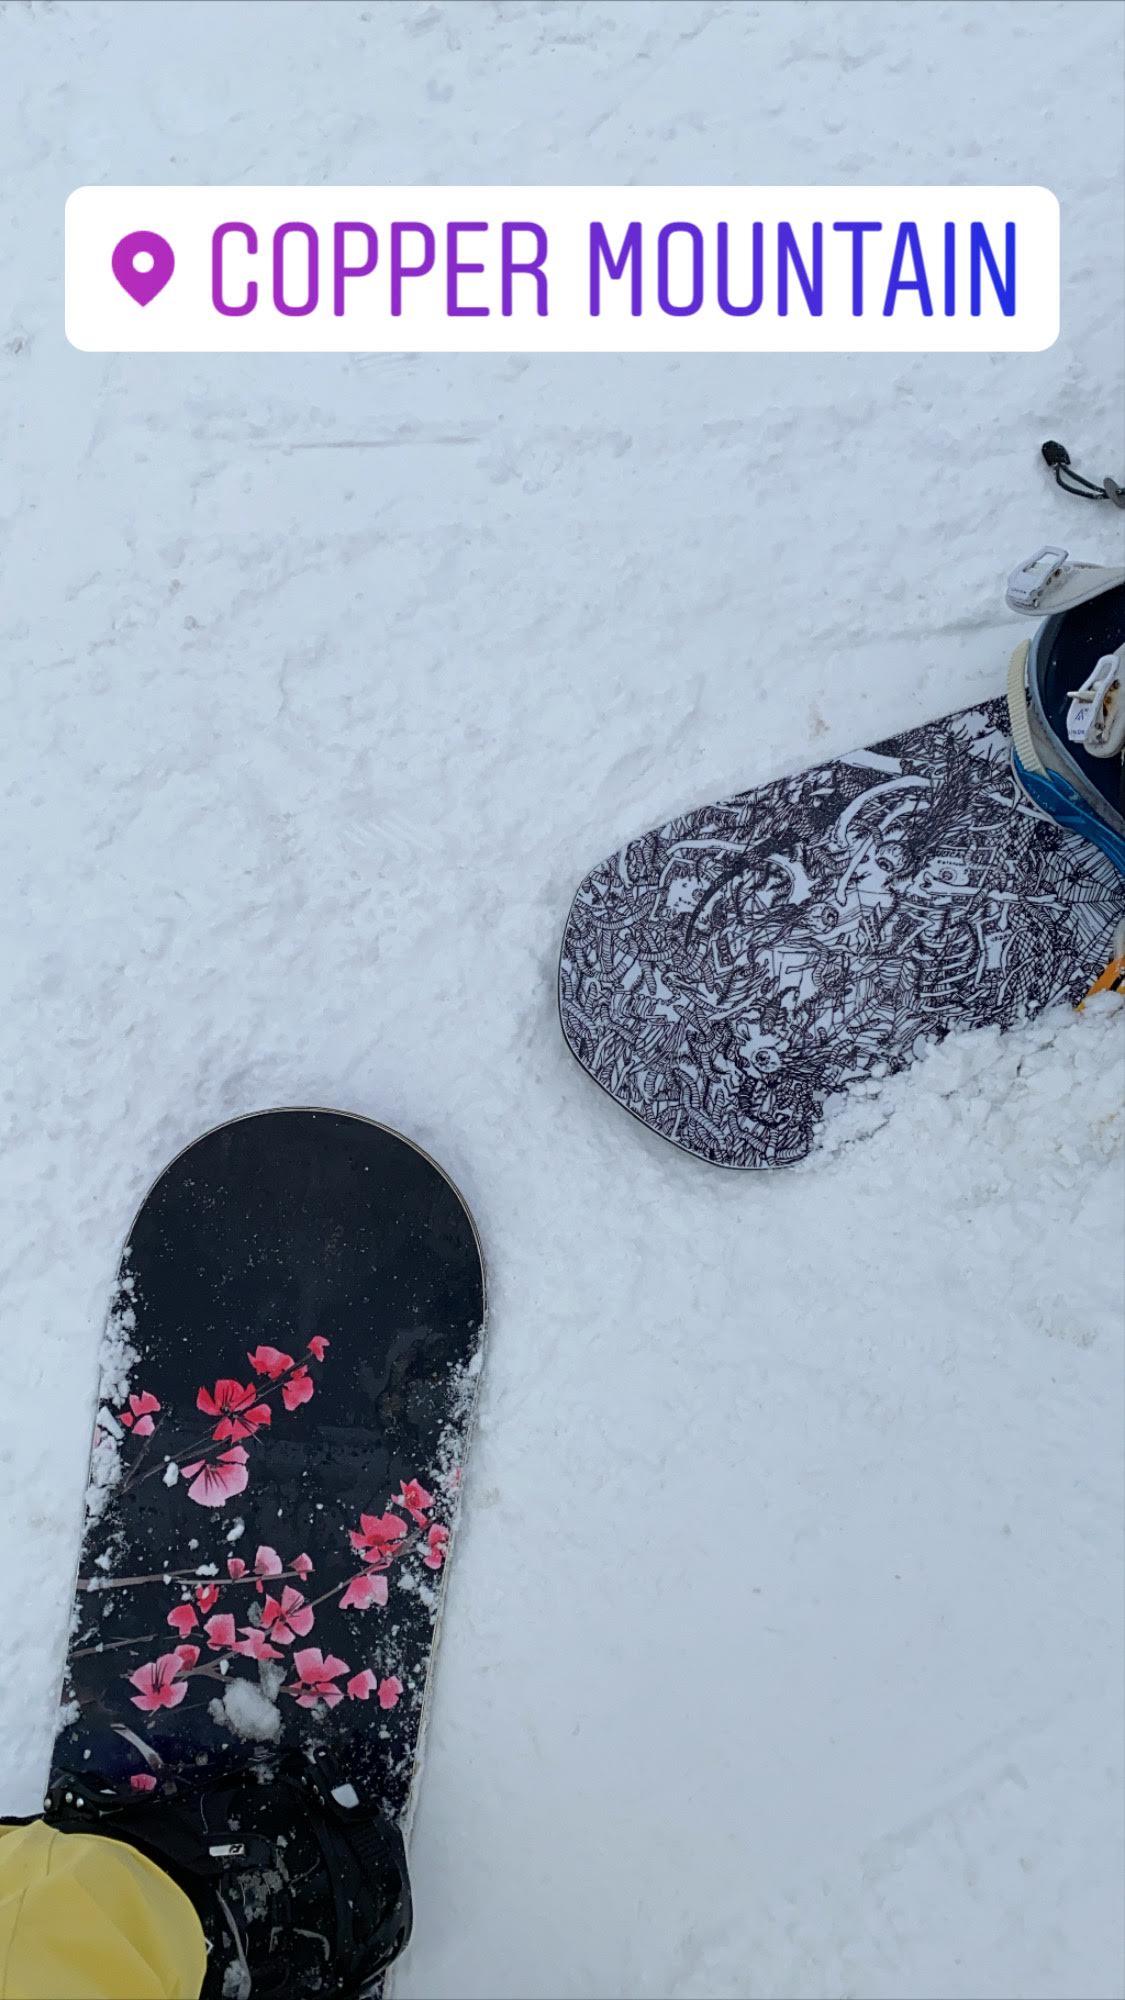 Copper Mountain Snowboarding